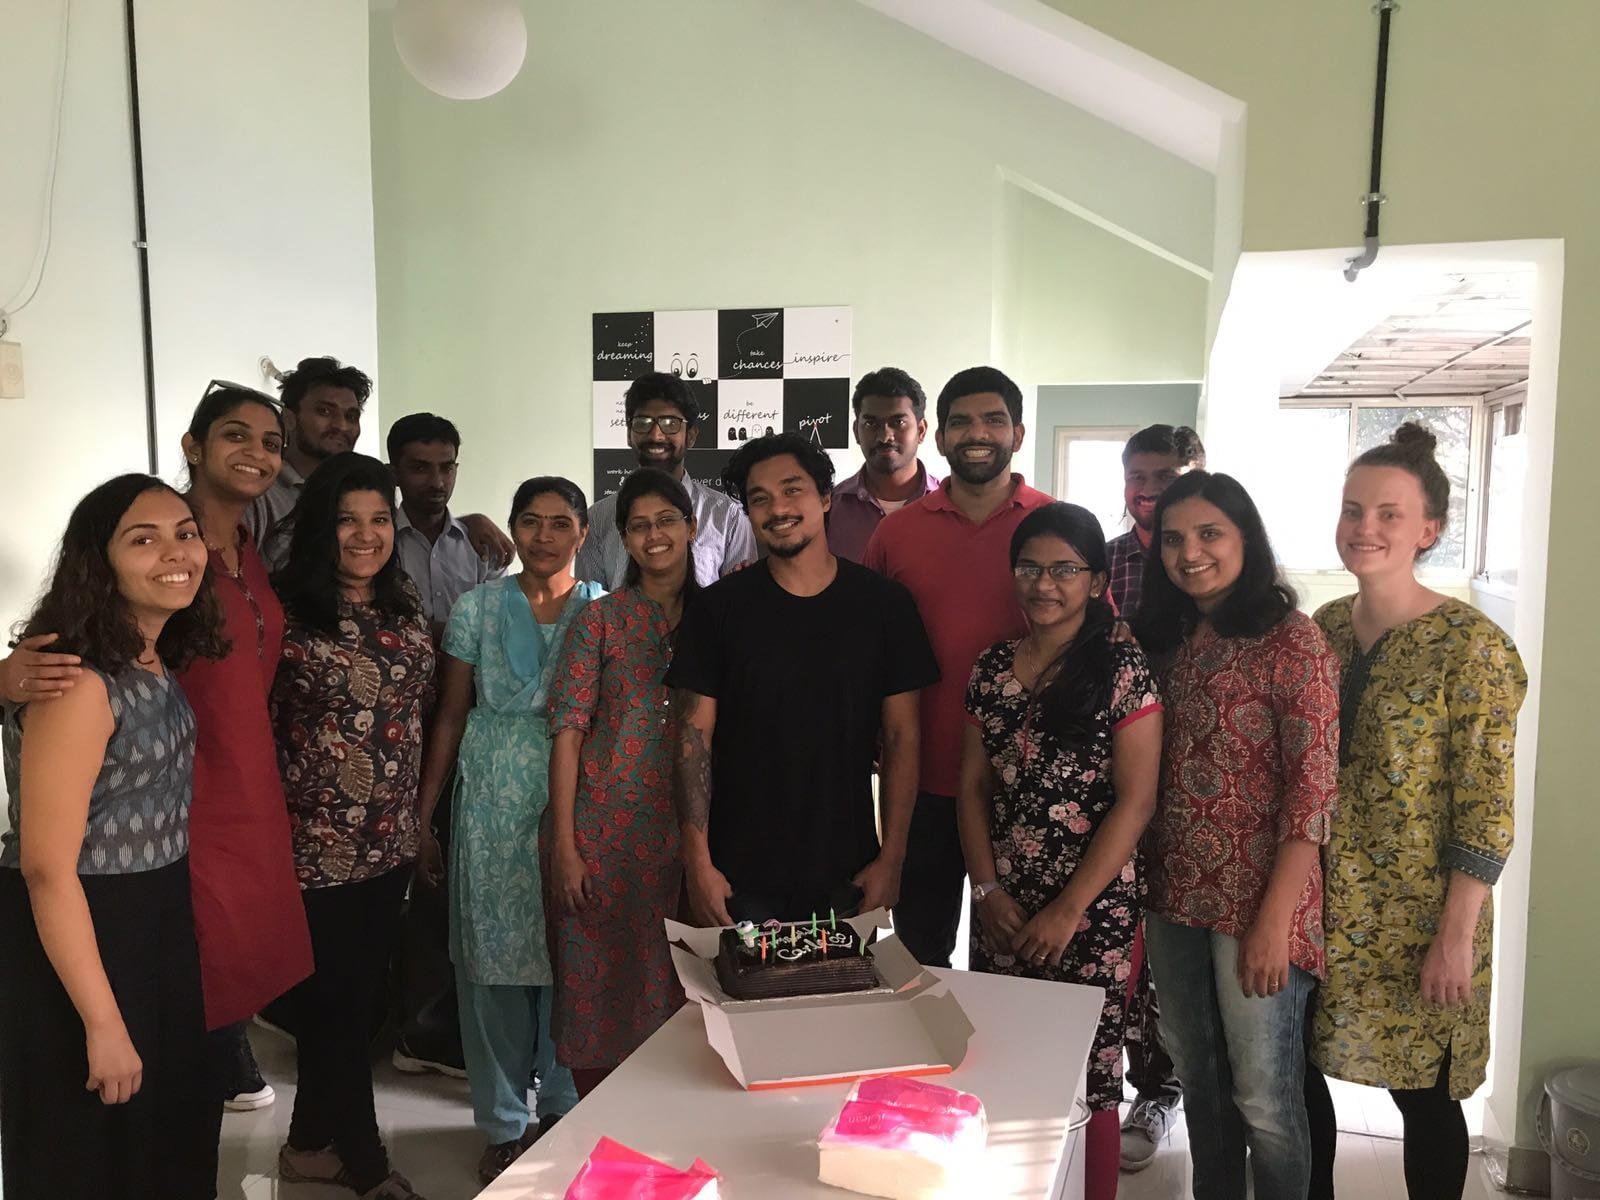 Carlo celebrated his birthday with the BEMPU team.